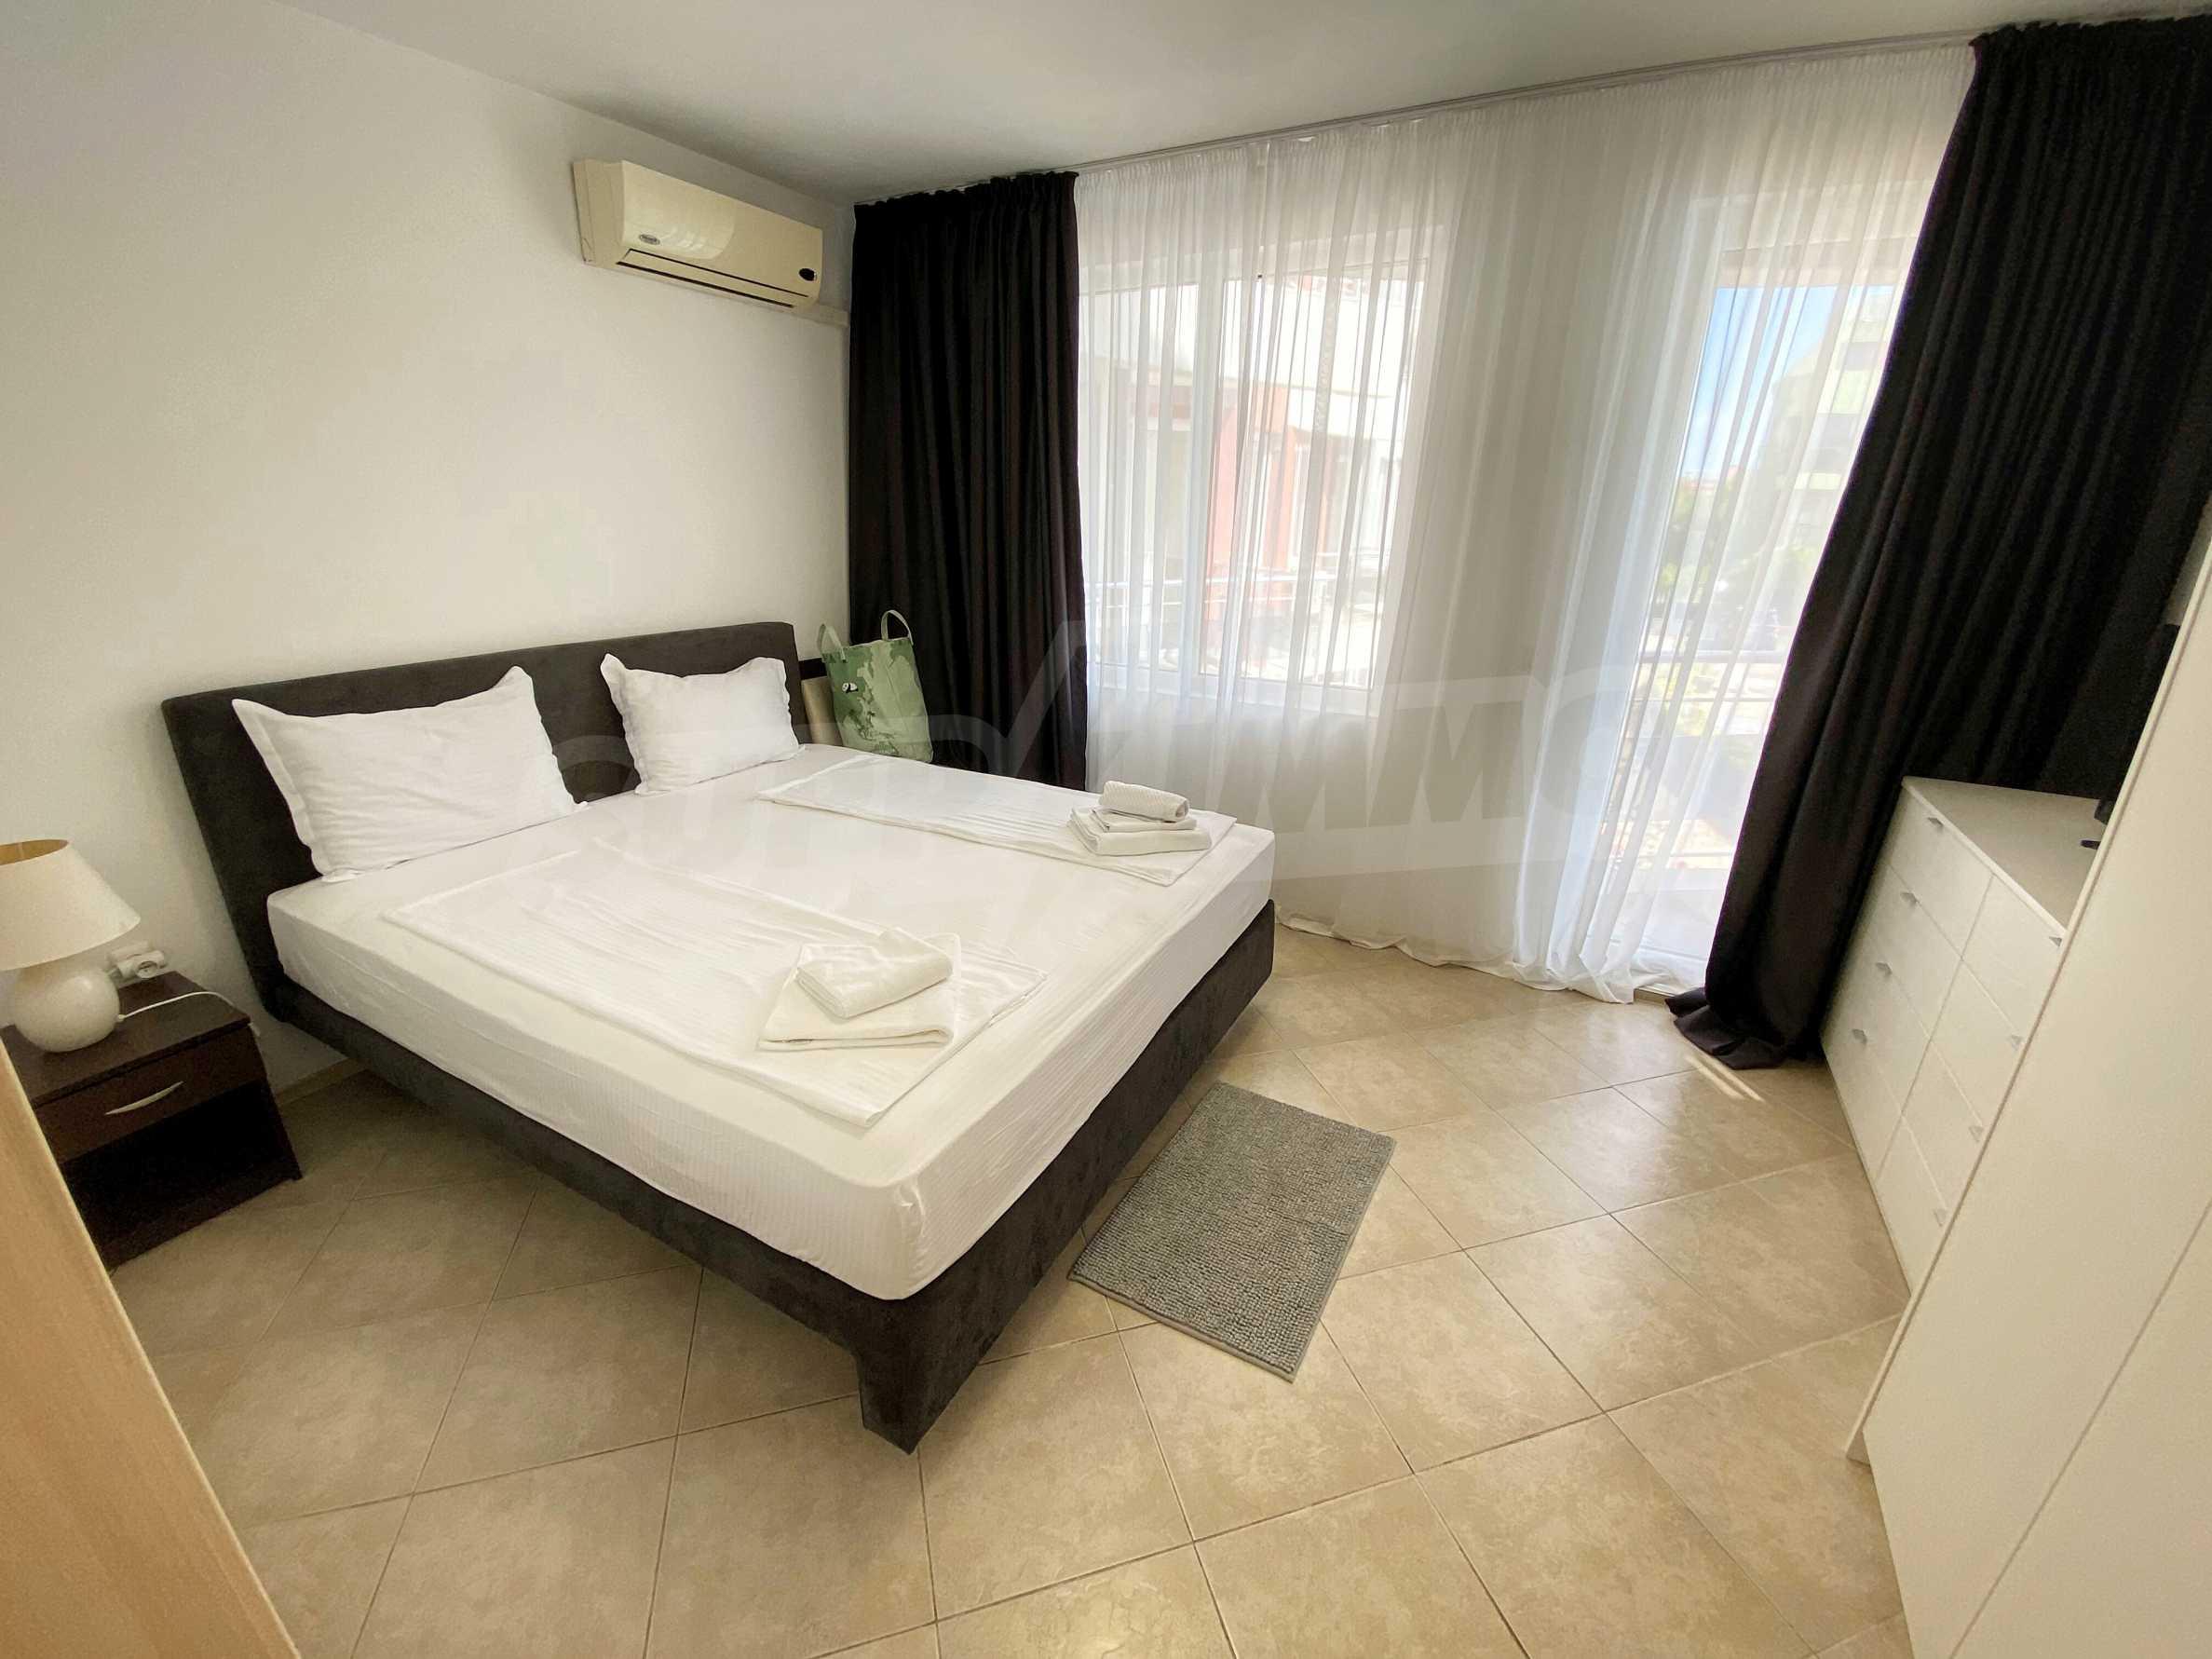 Тристаен апартамент близо до плажа в комплекс Емберли в Лозенец (ап. №201) 17